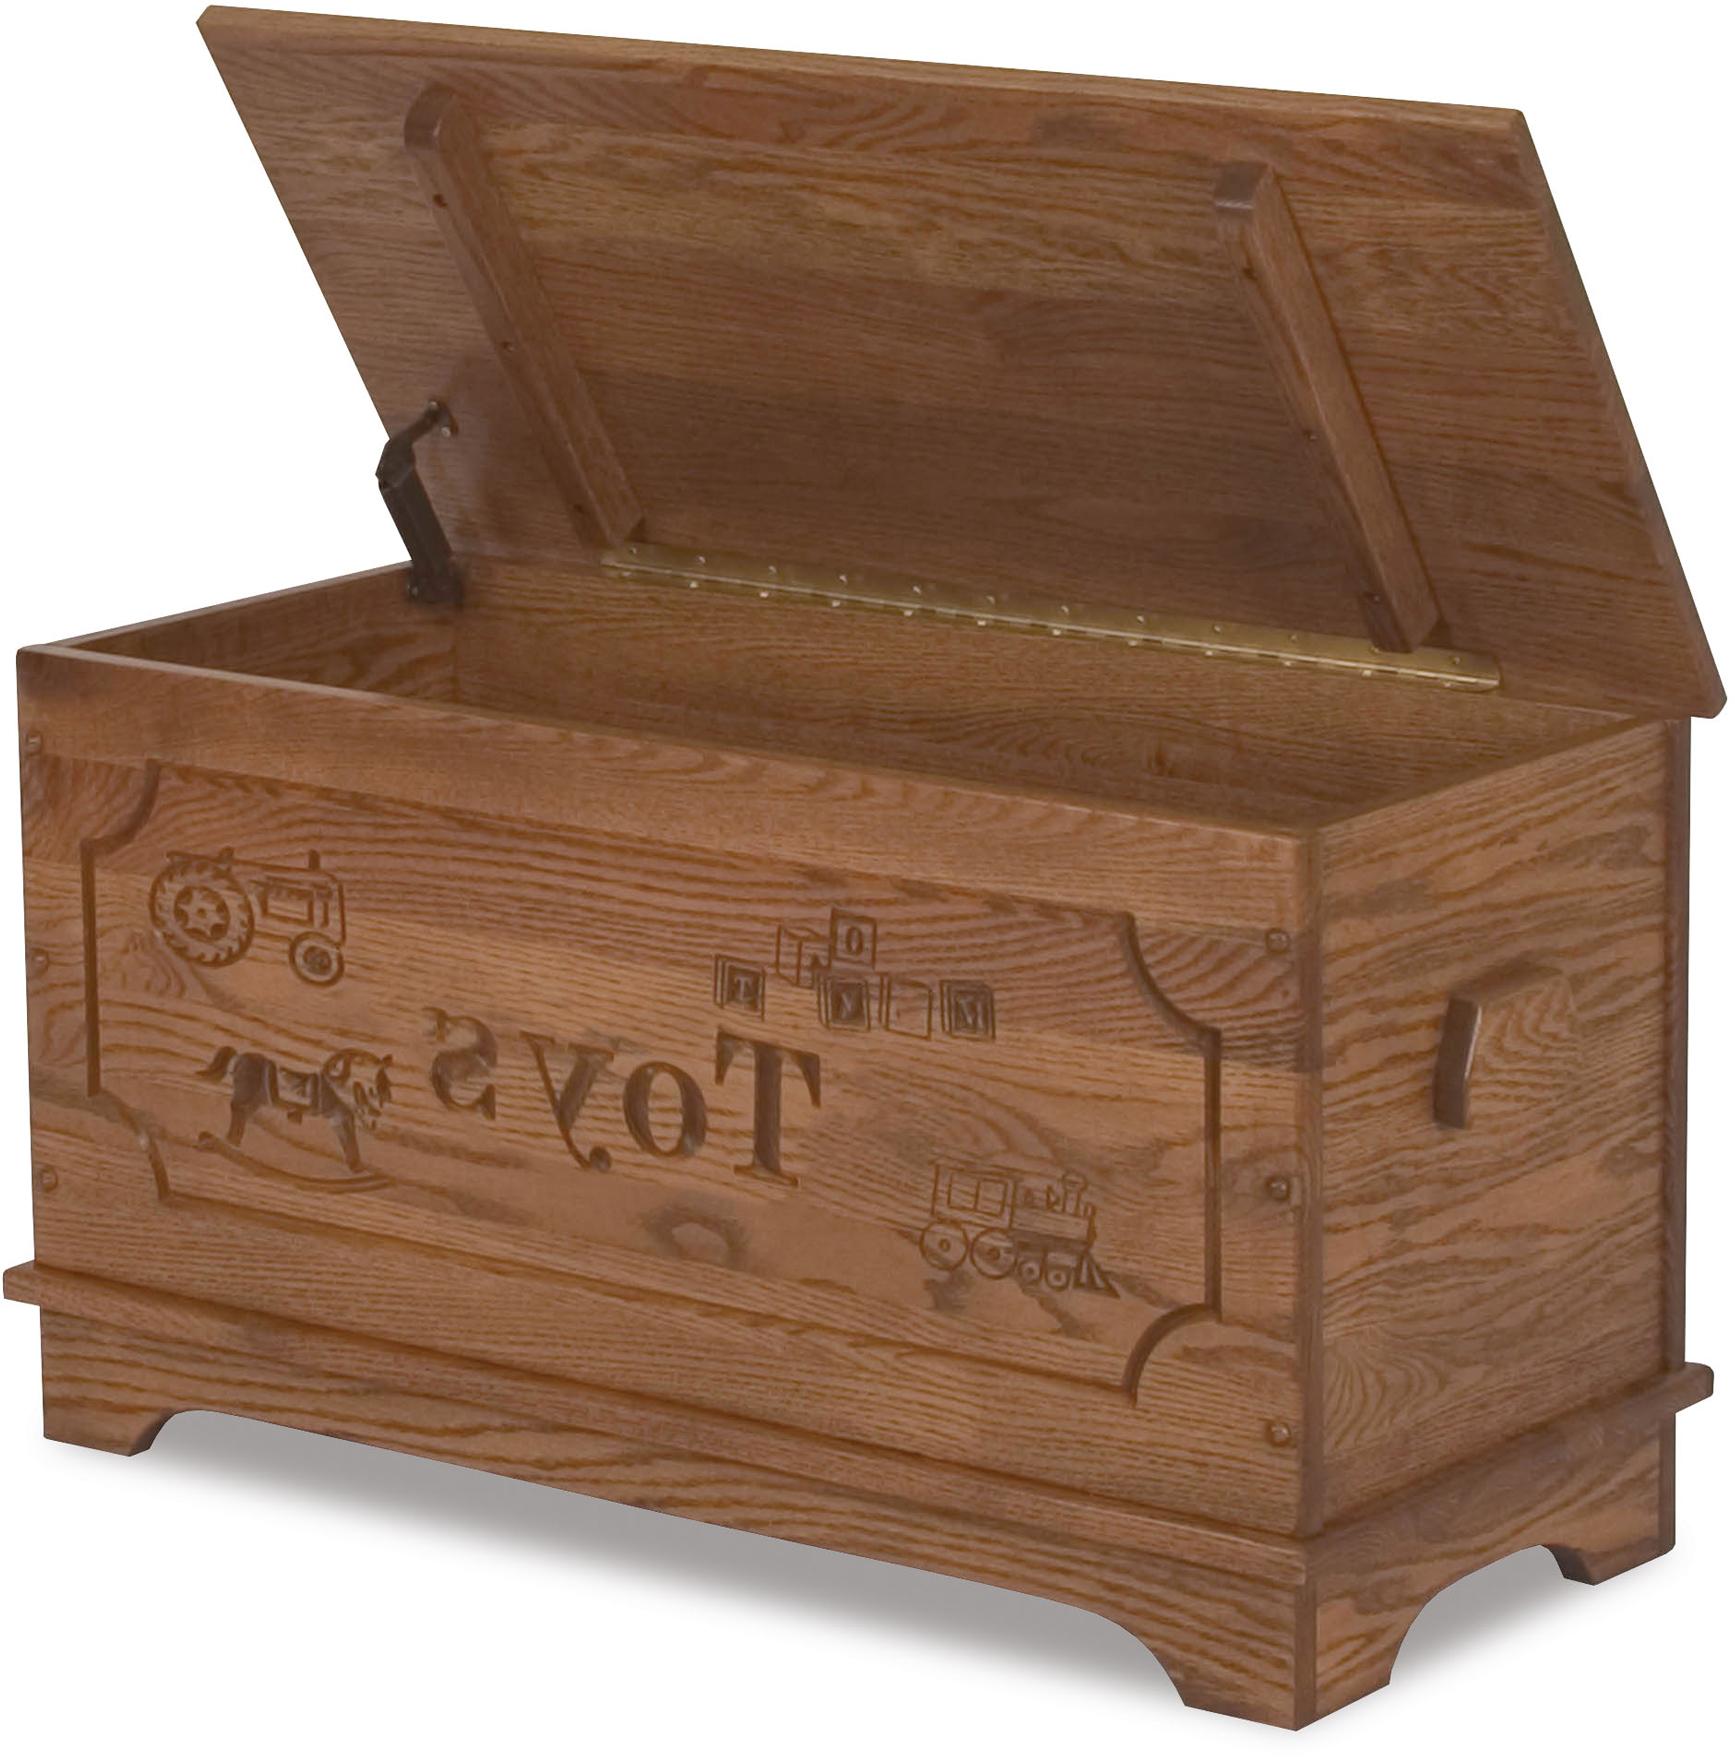 Large New Wooden Storage Box Diy Crates Toy Boxes Set: Custom Amish Furniture